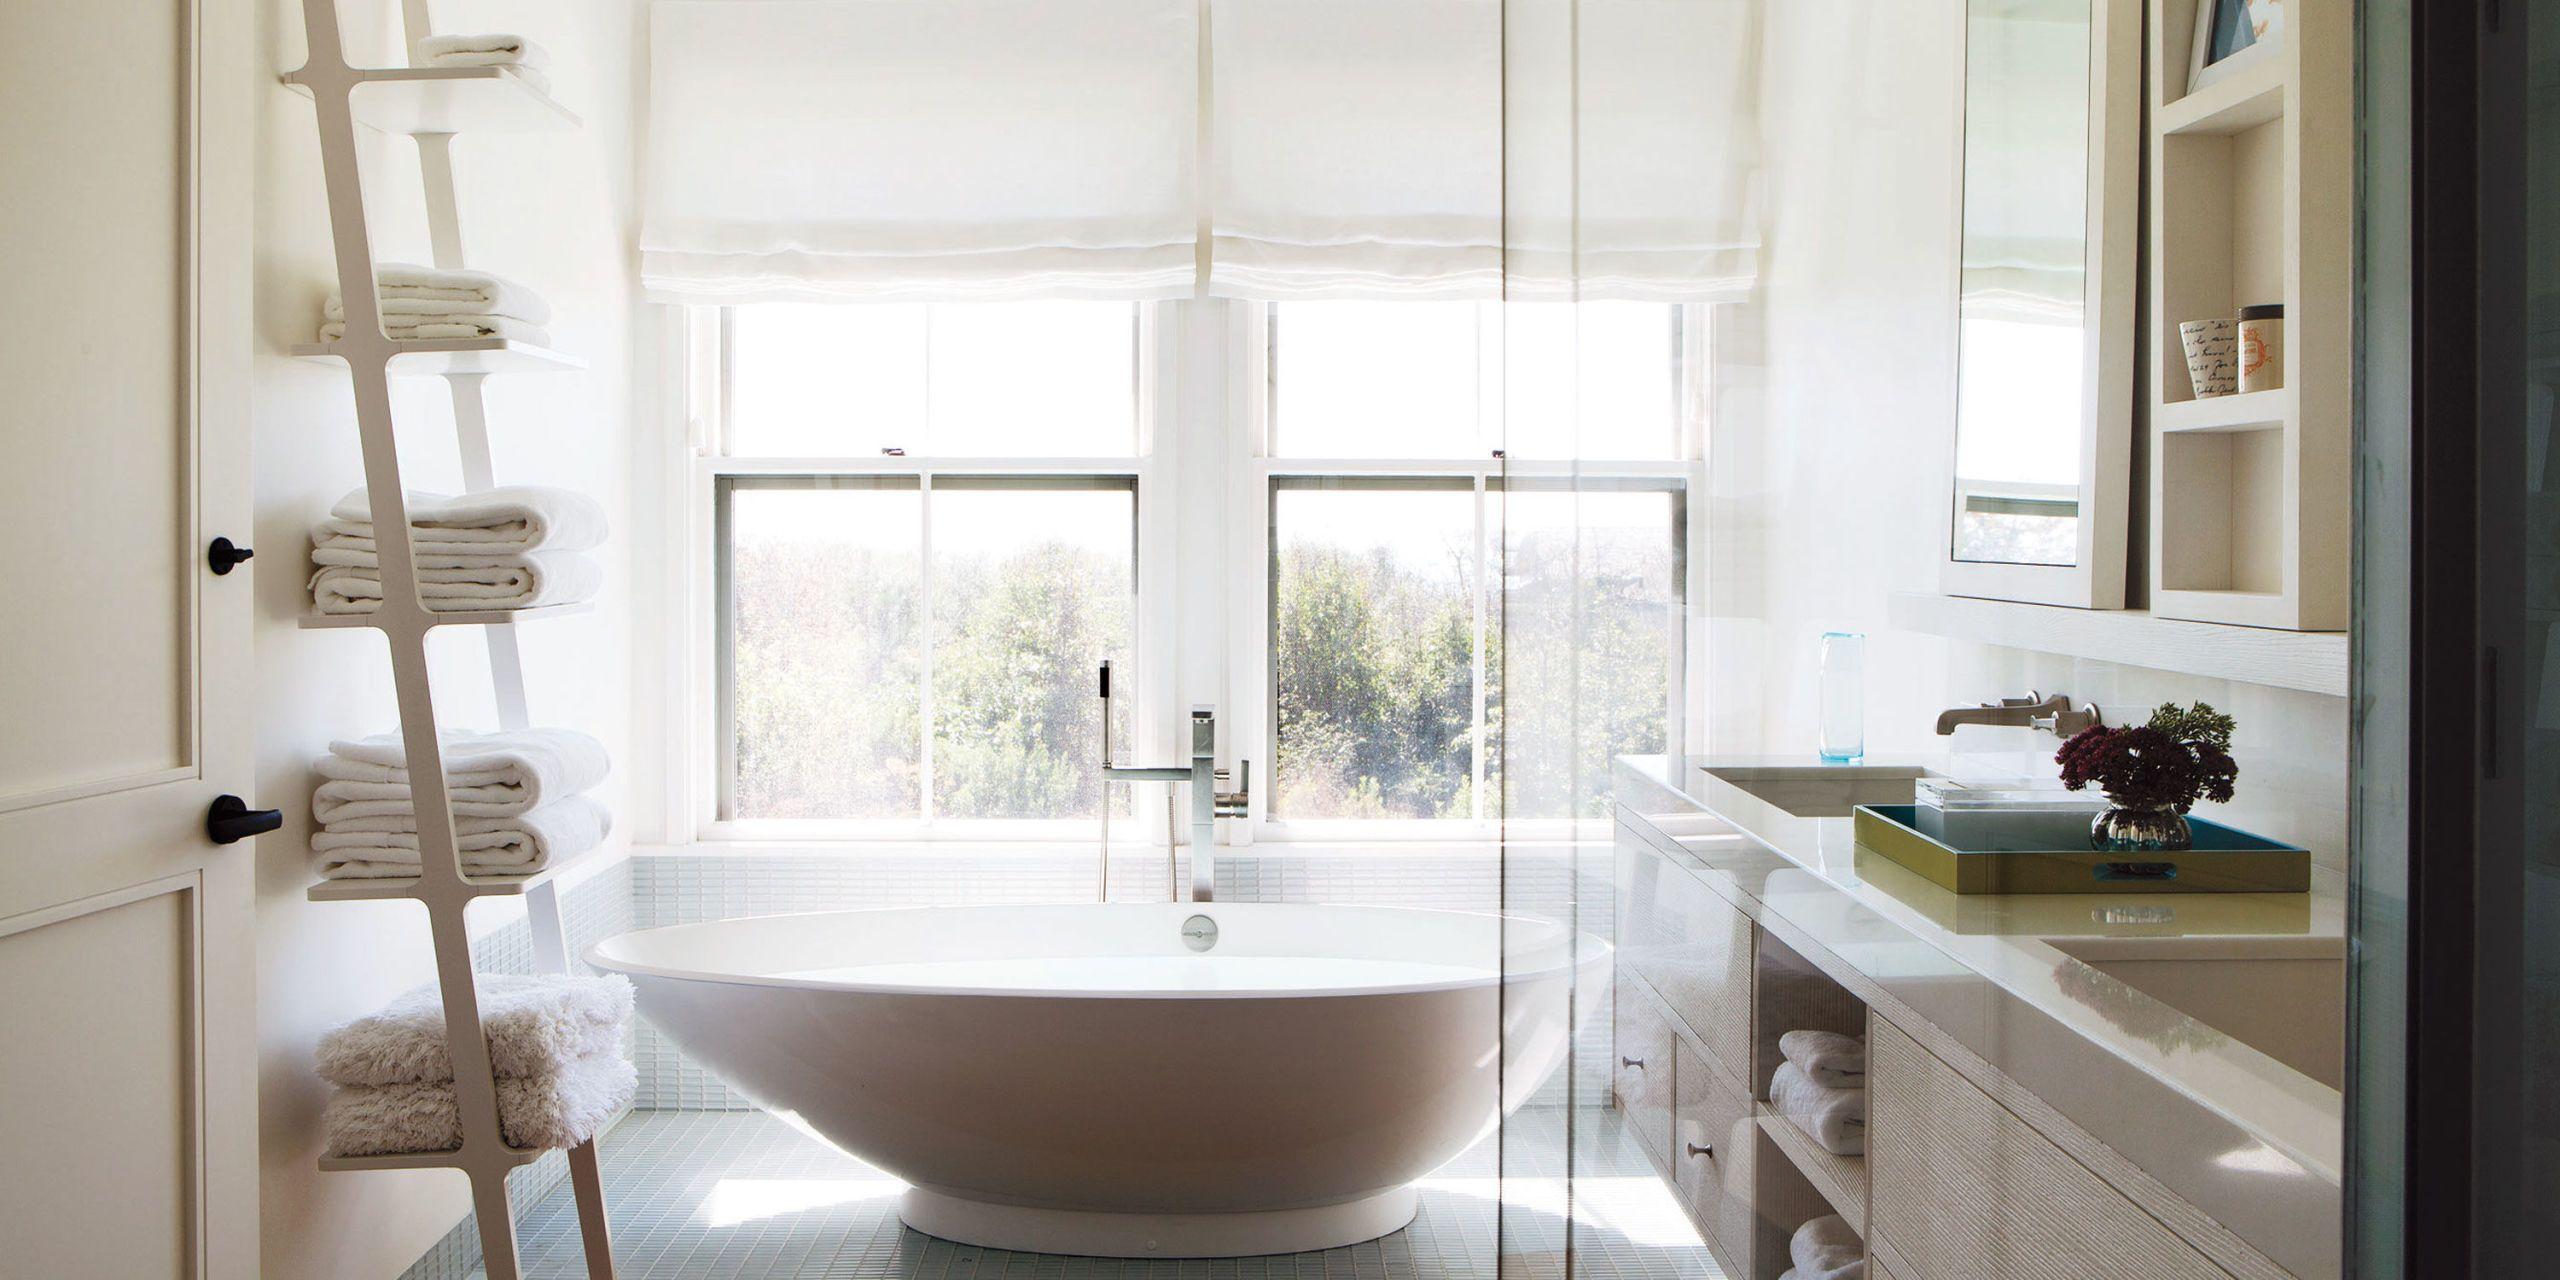 80 Best Bathroom Design Ideas Gallery Of Stylish Small Large Rh Elledecor  Com